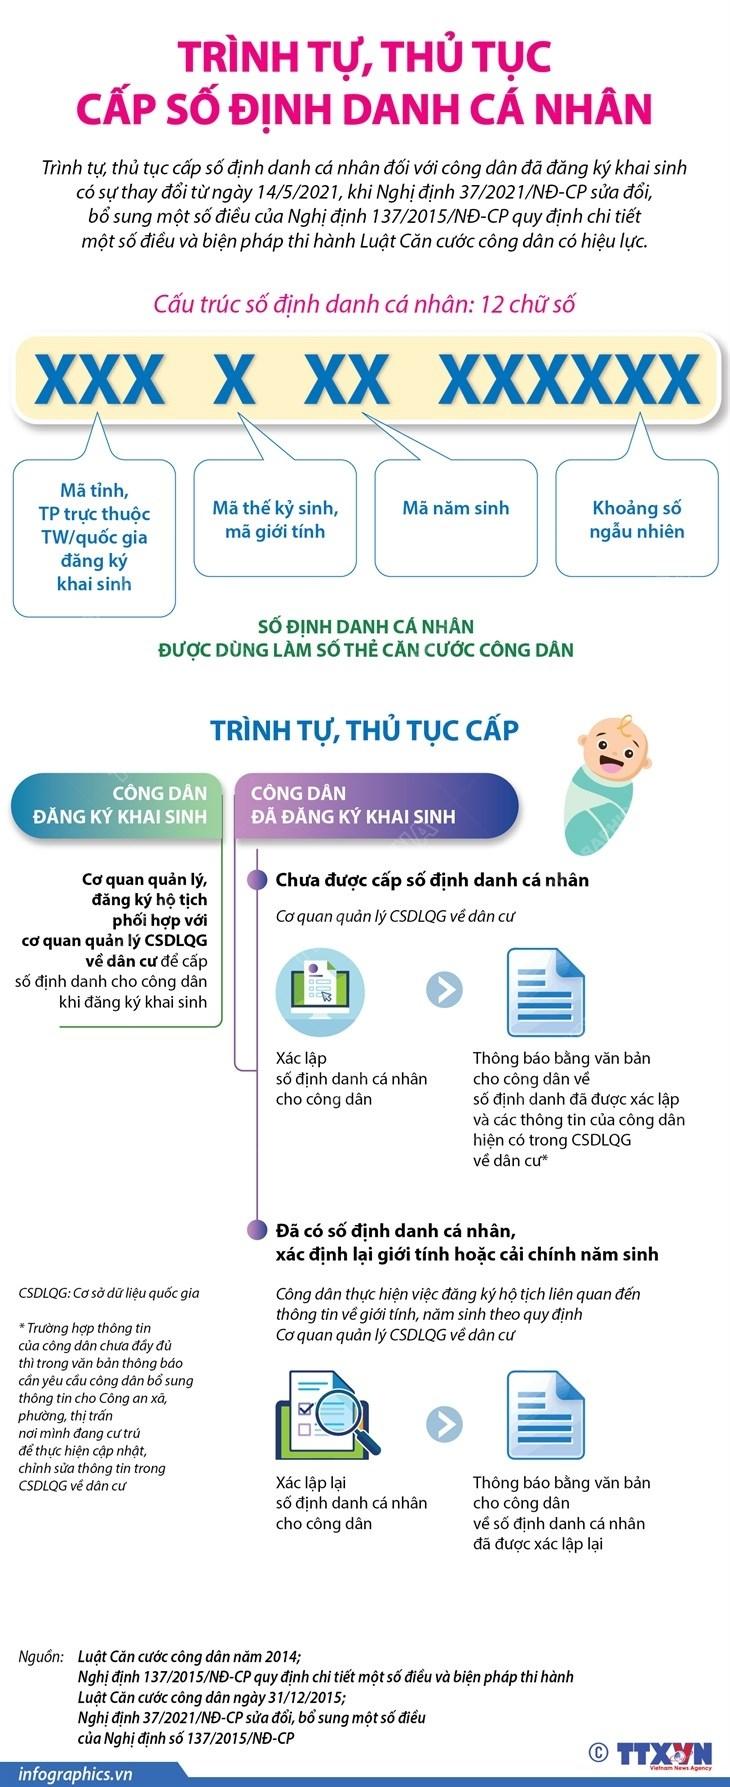 [Infographics] Trinh tu, thu tuc cap so dinh danh ca nhan hinh anh 1